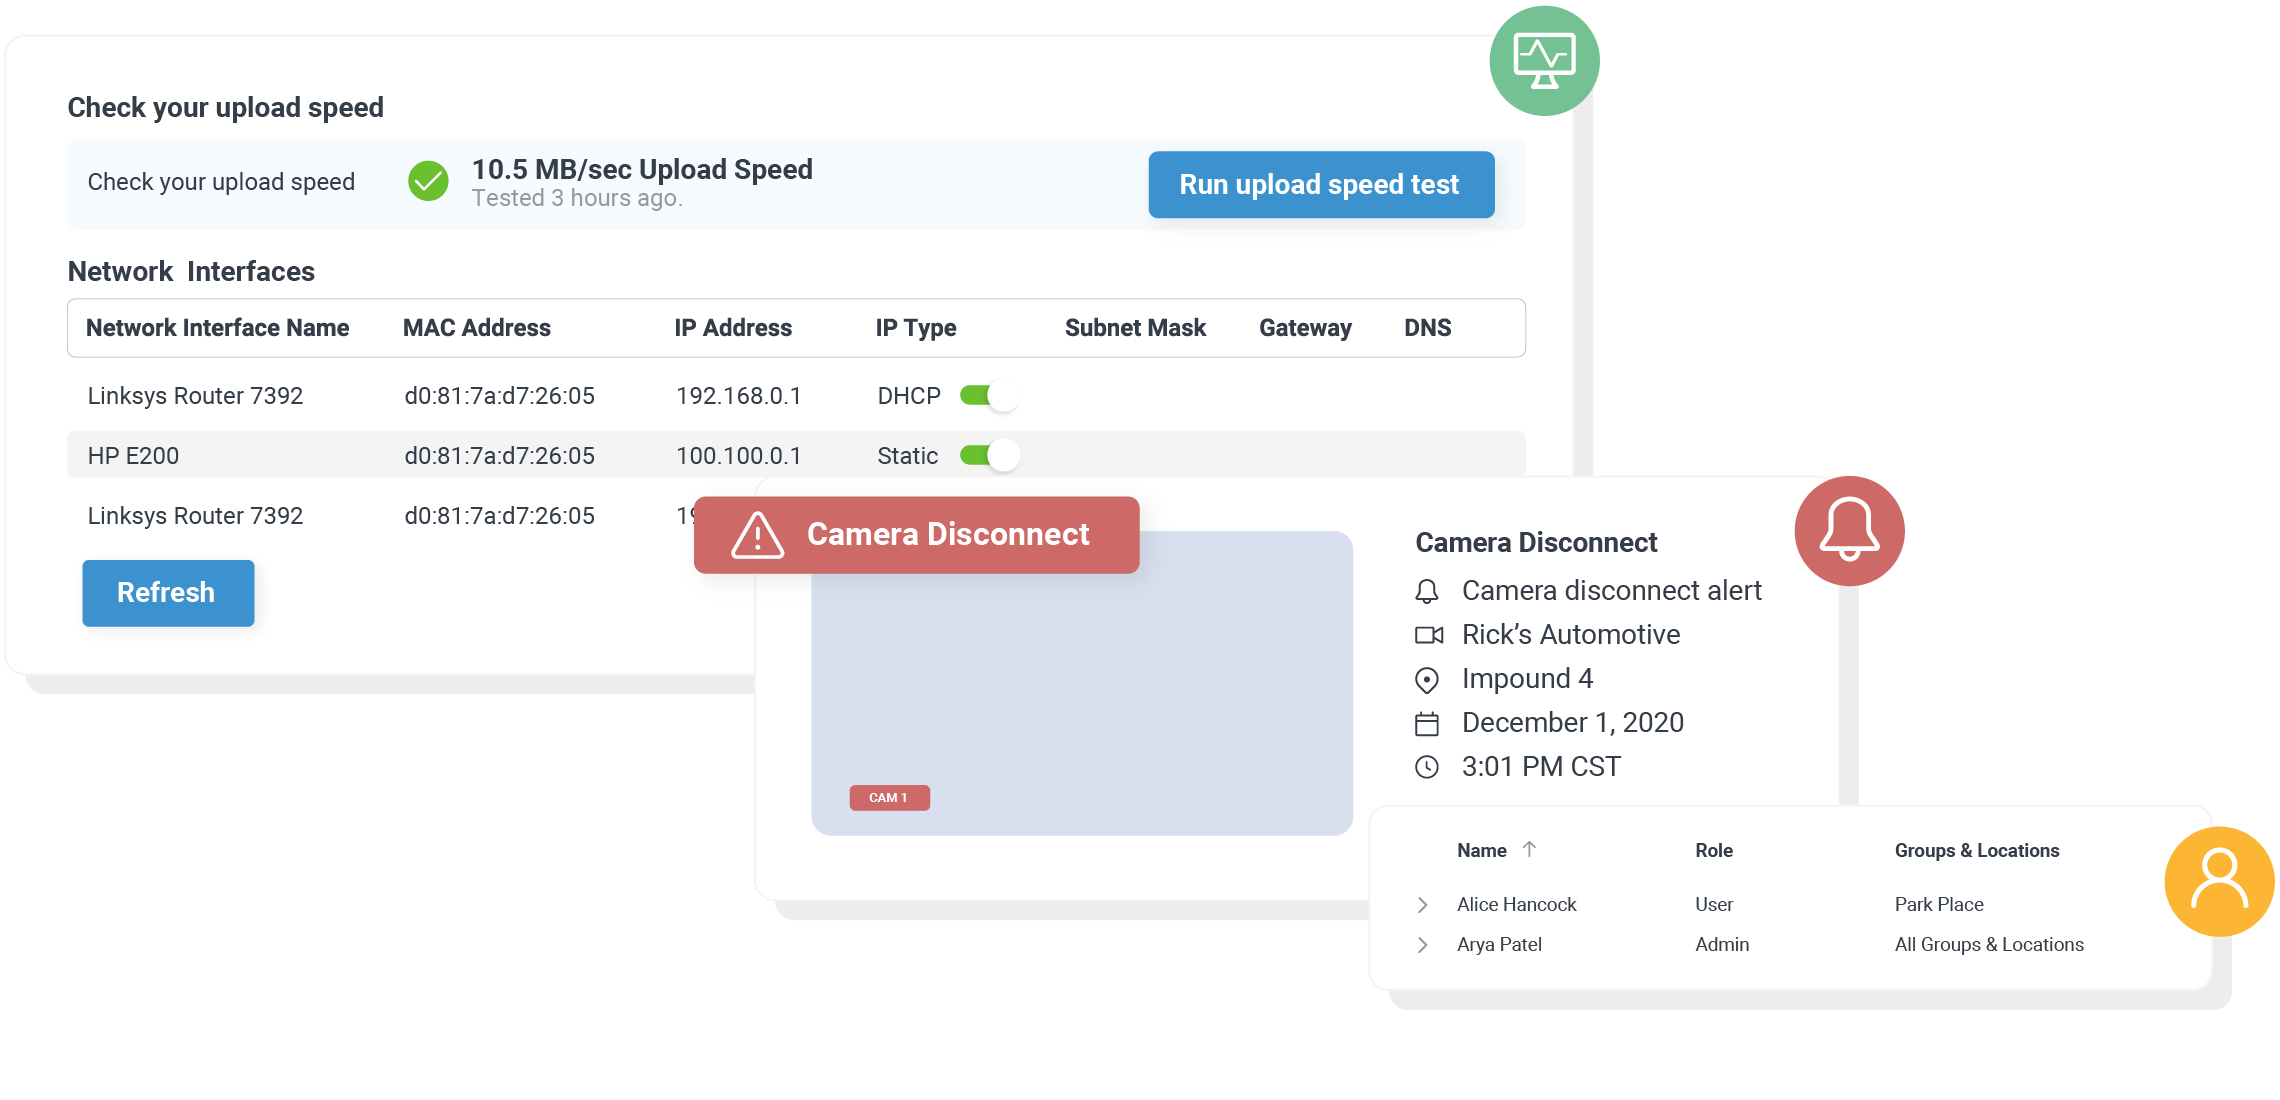 modals of camera health diagnostics and user UI